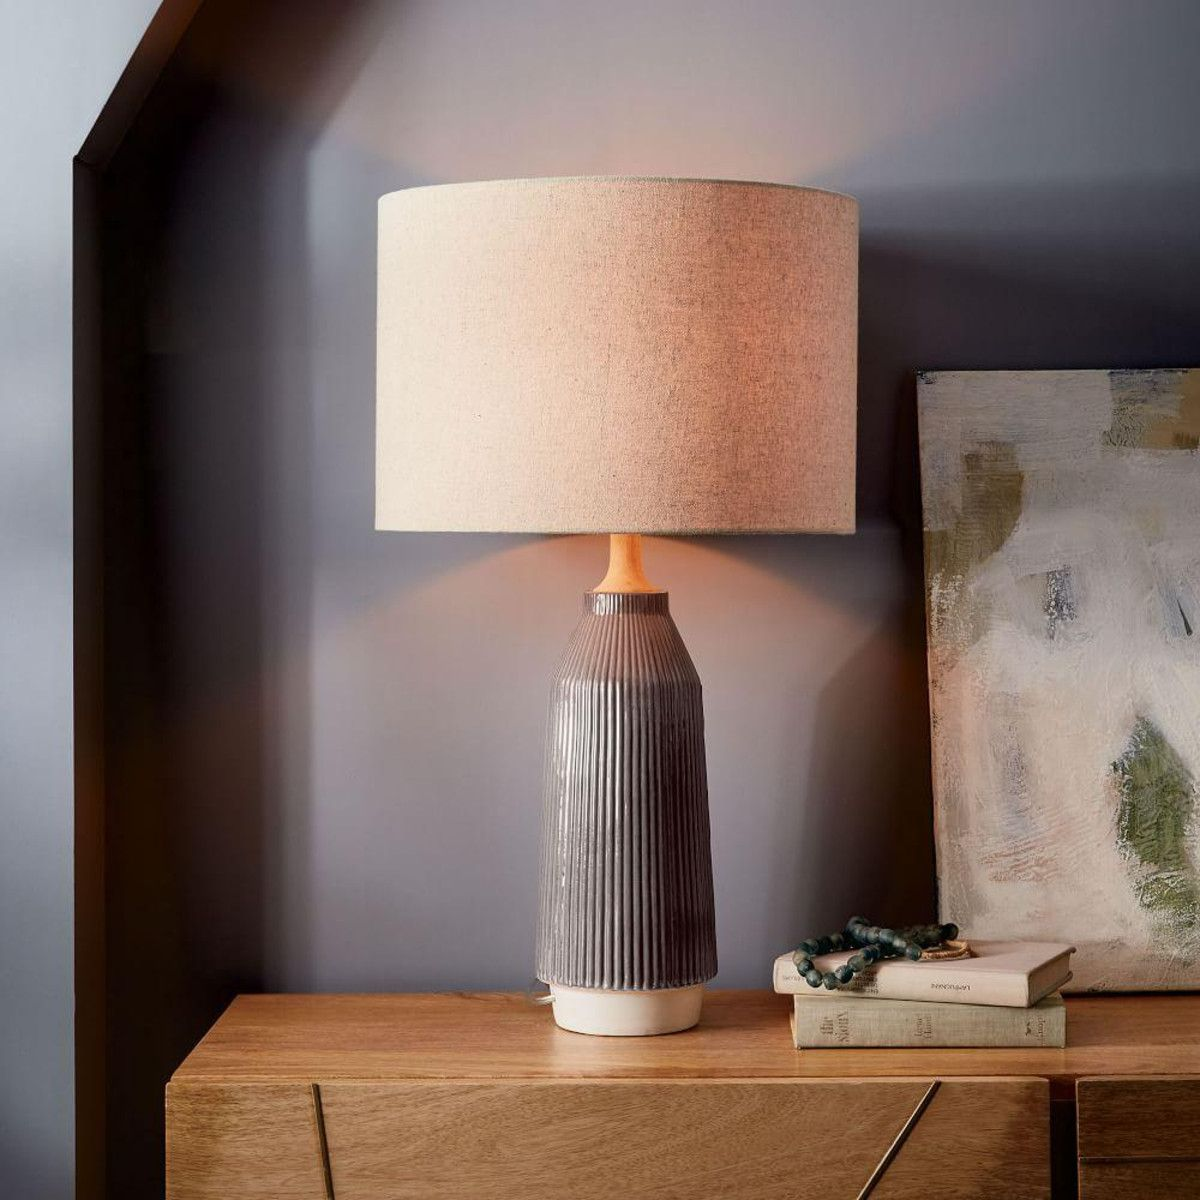 Delicieux $229 Roar + Rabbit™ Ripple Ceramic Table Lamp   Large Narrow (Warm Grey)